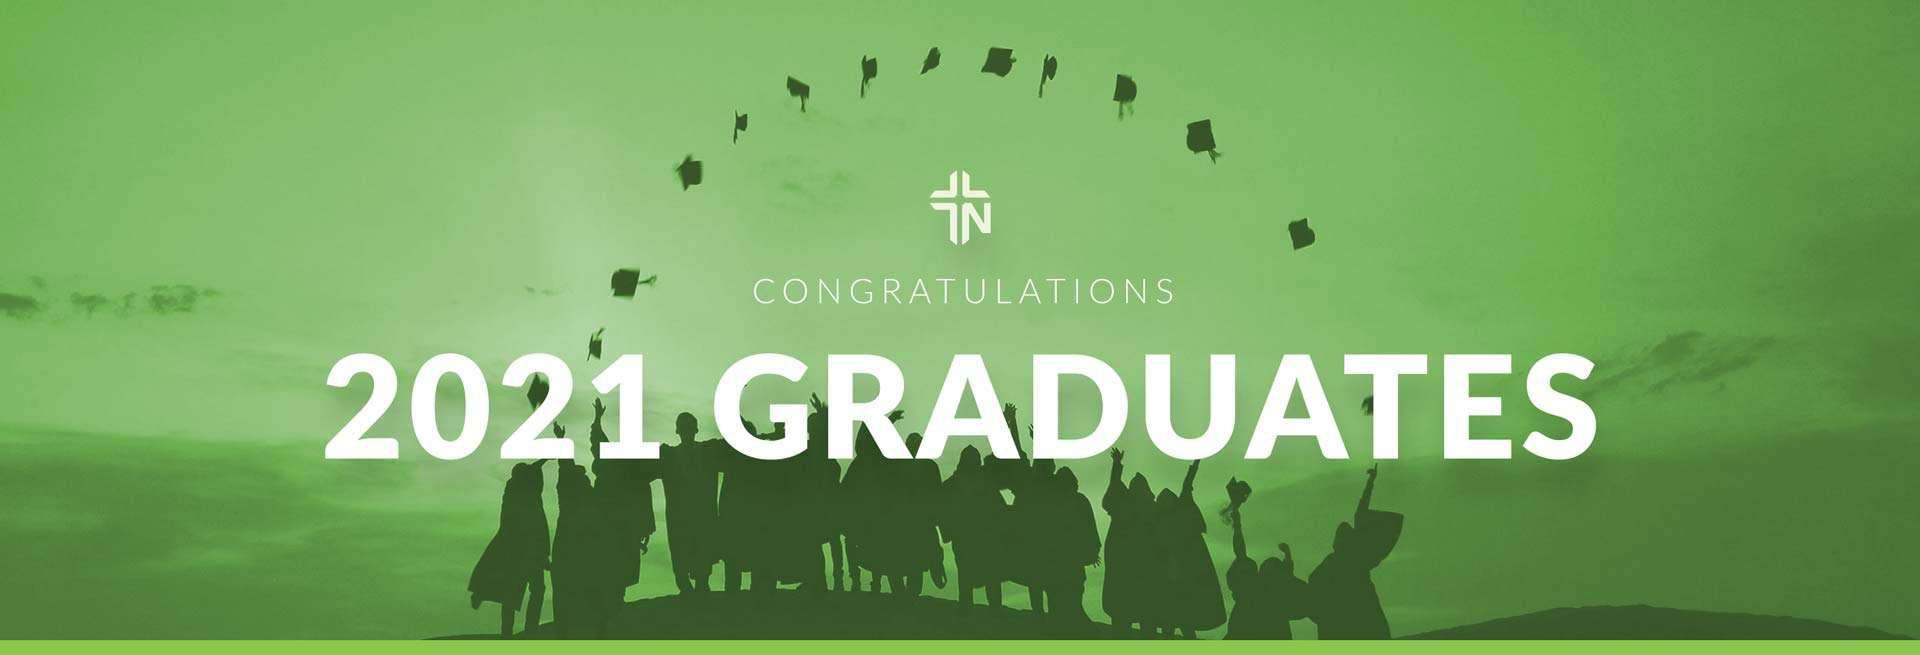 graduation - Celebrating 2021 Graduates